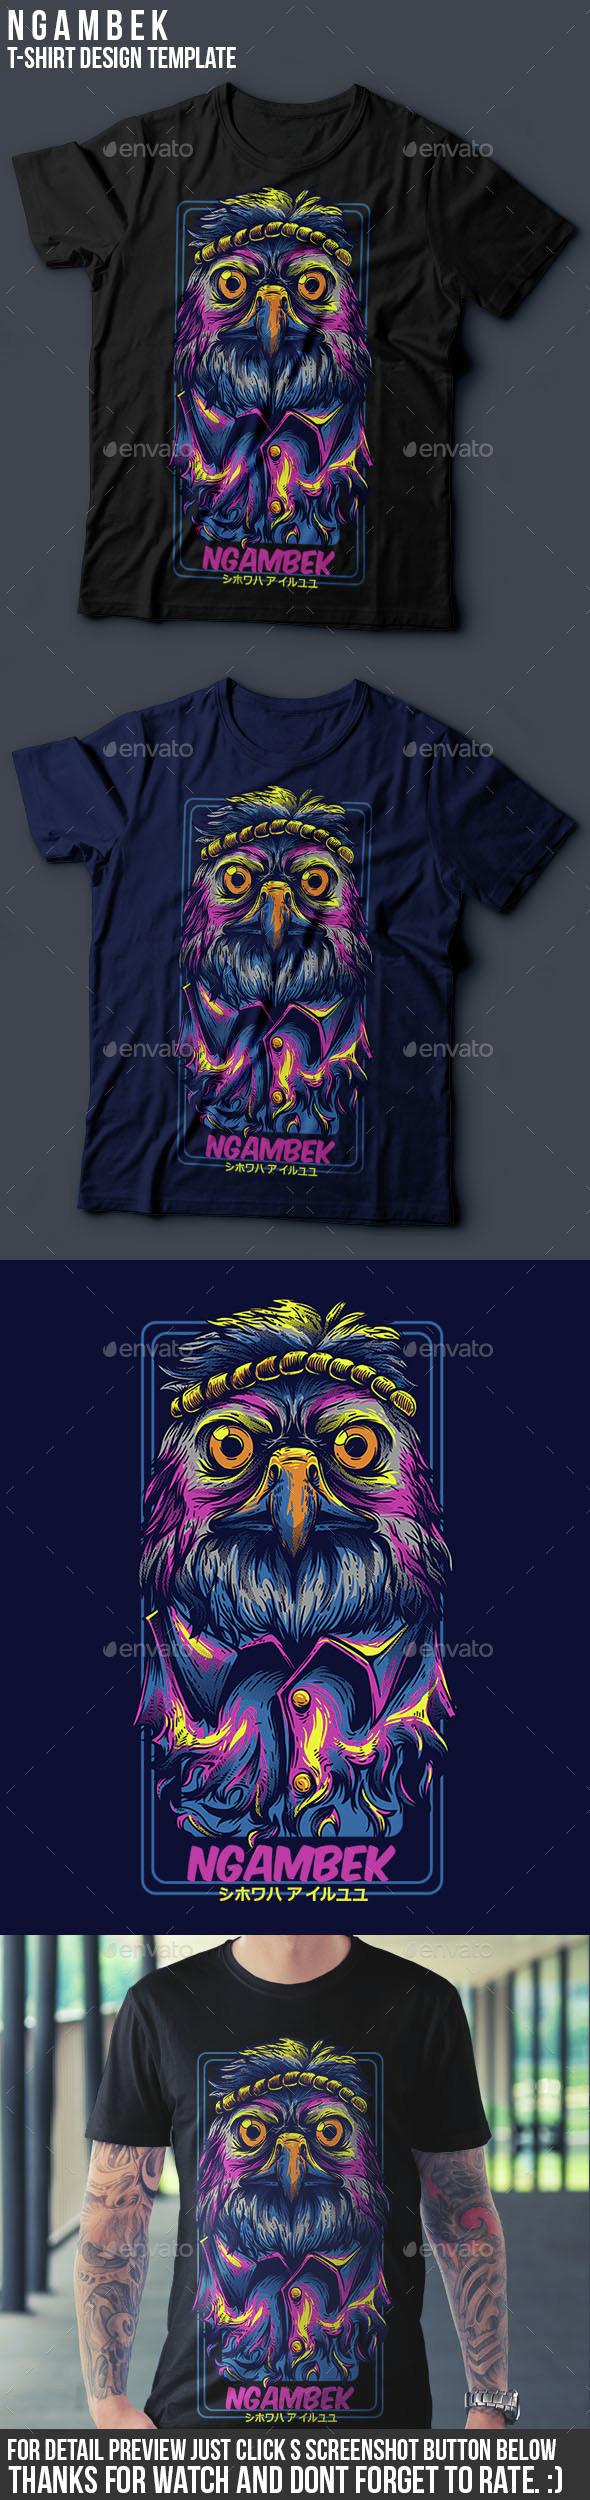 Ngambek T-Shirt Design - Funny Designs